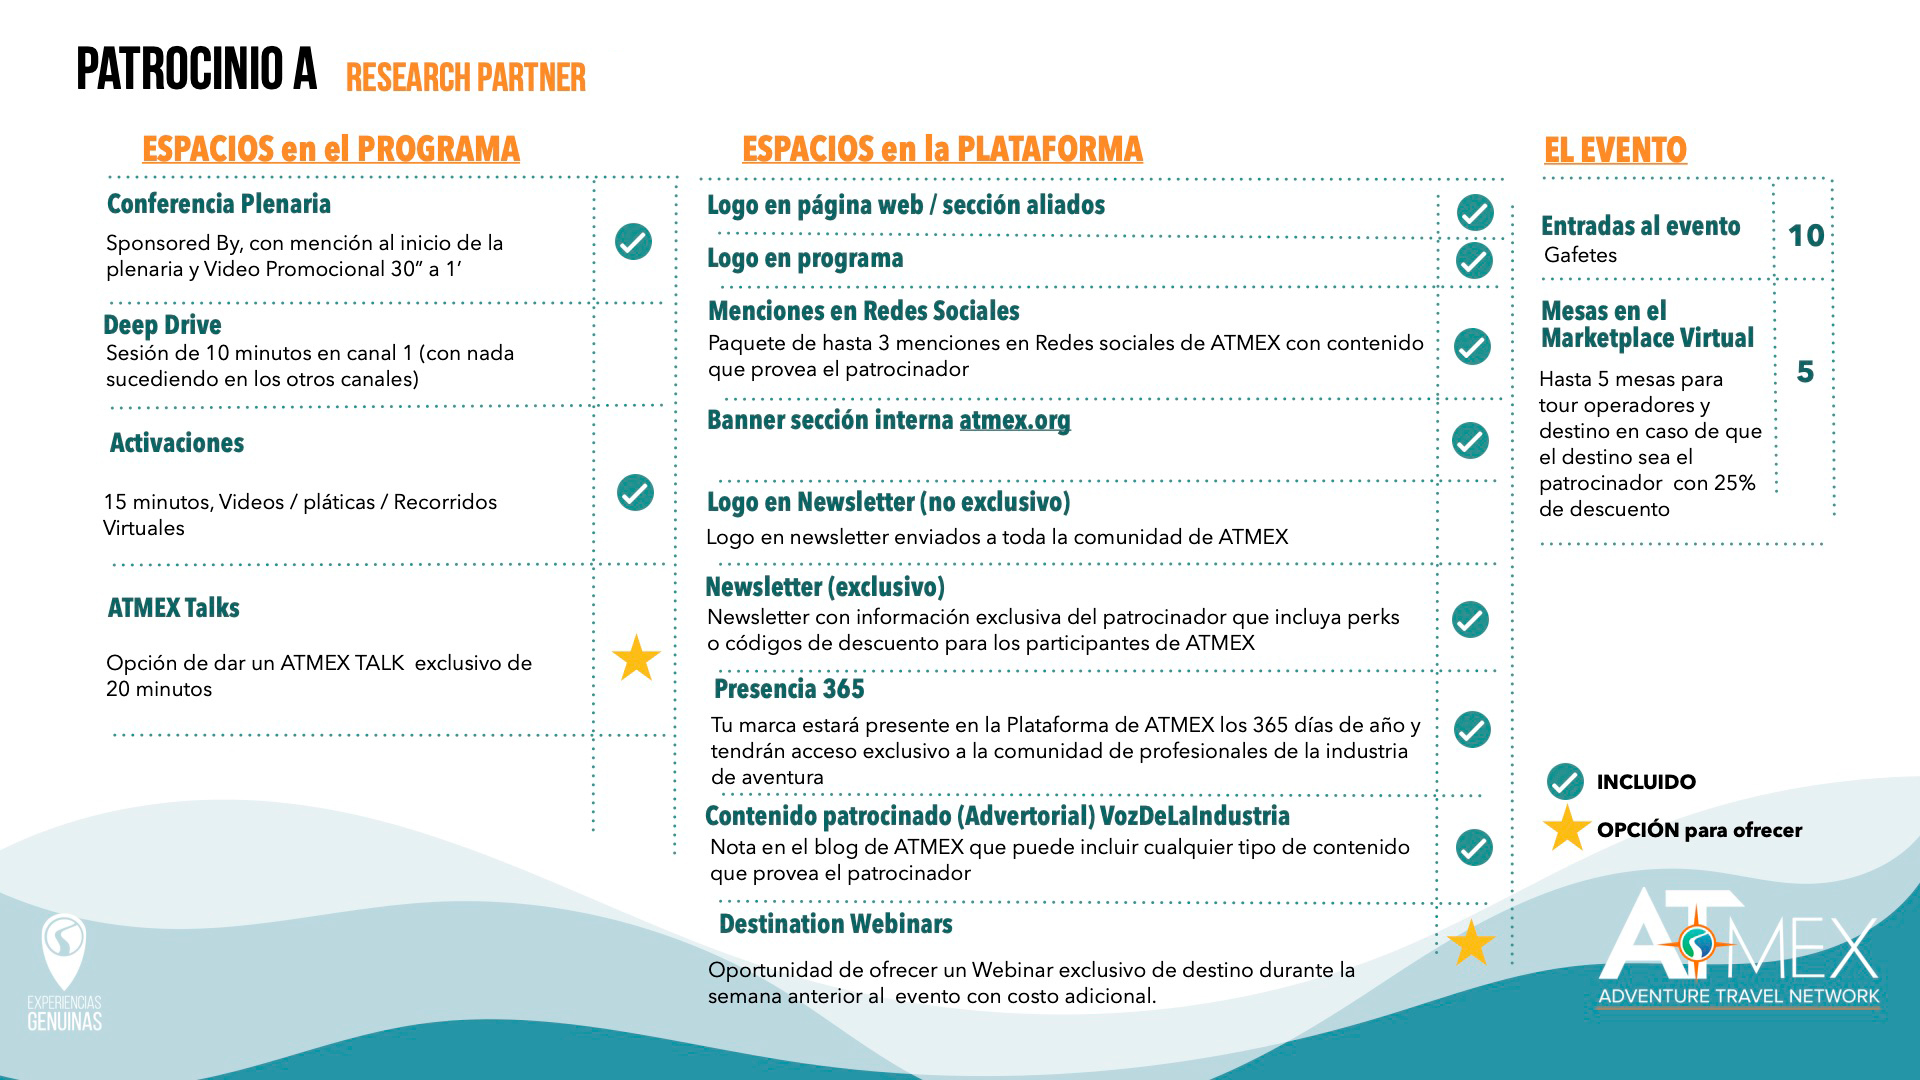 ATMEX-Patrocinio-research-partner